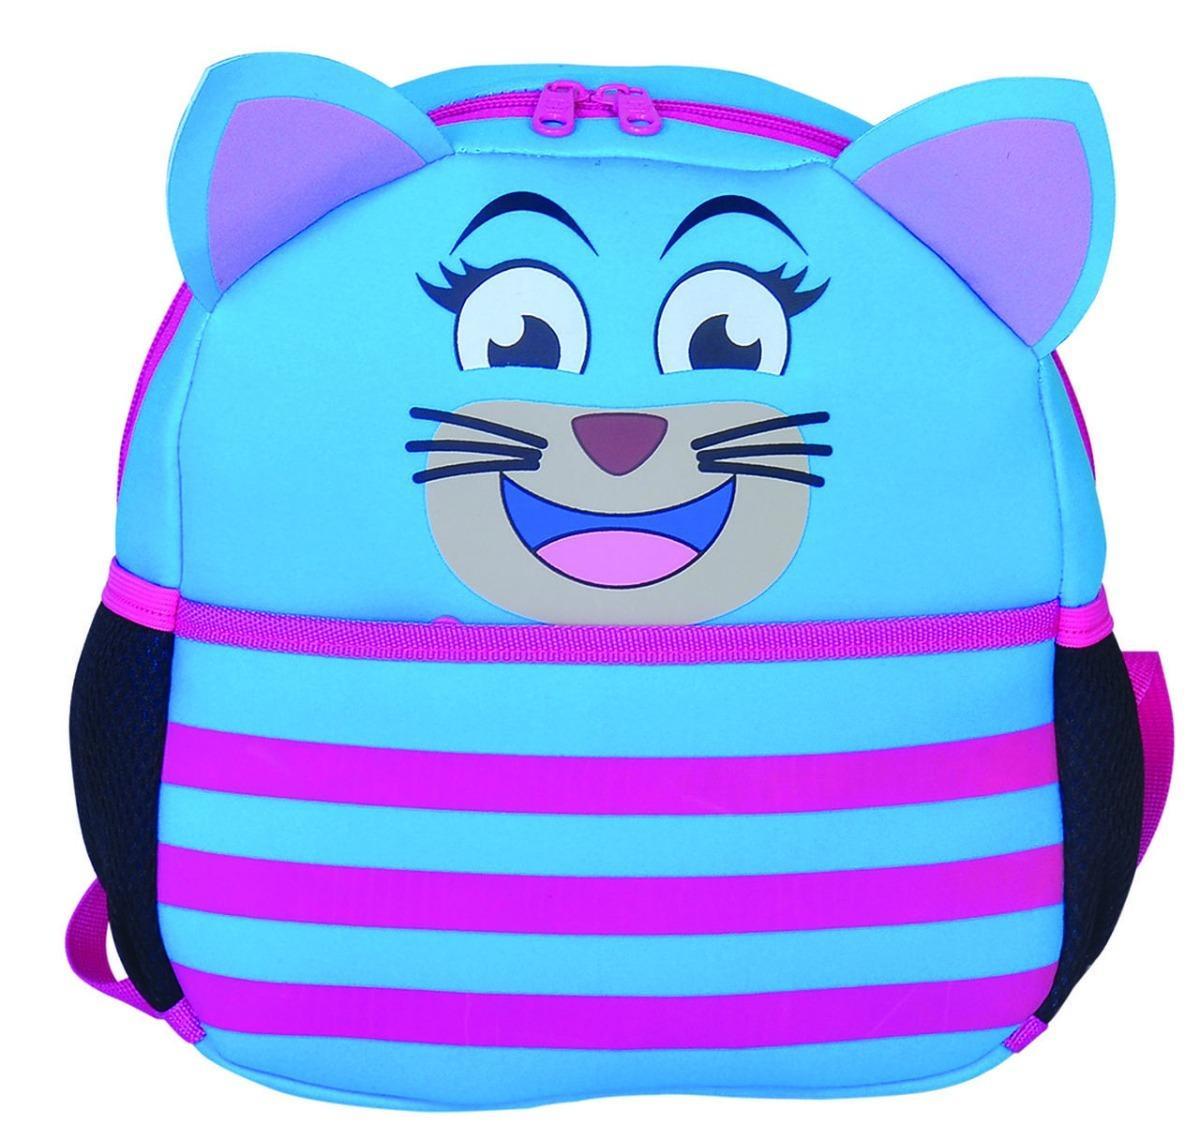 Mochila Térmica Infantil Gatinho Azul Bolsa 25x30 Cm - Wincy